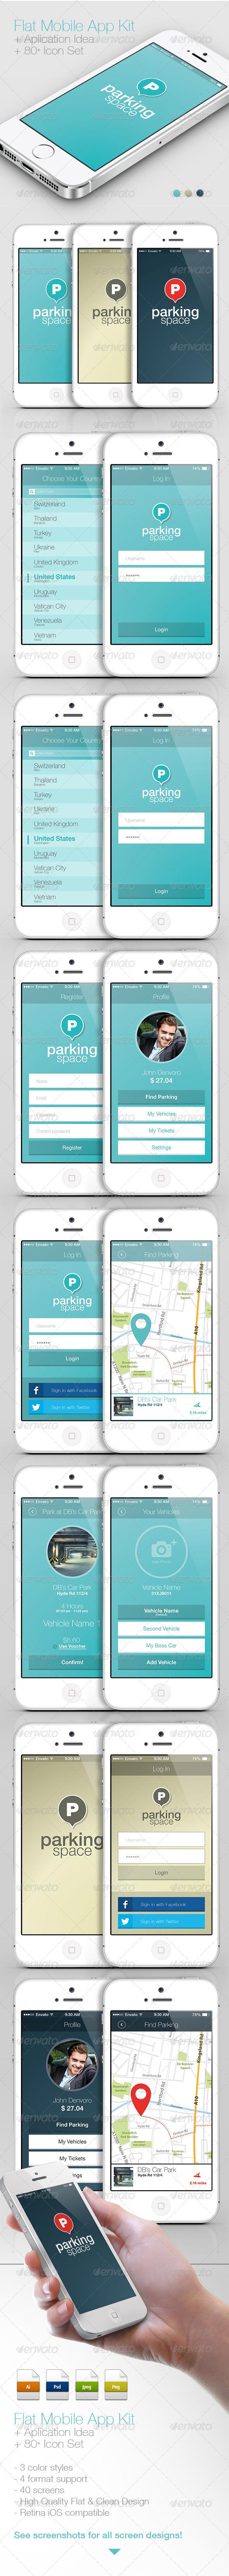 Flat Mobile App Kit / App Idea / Icon Set - User Interfaces Web Elements